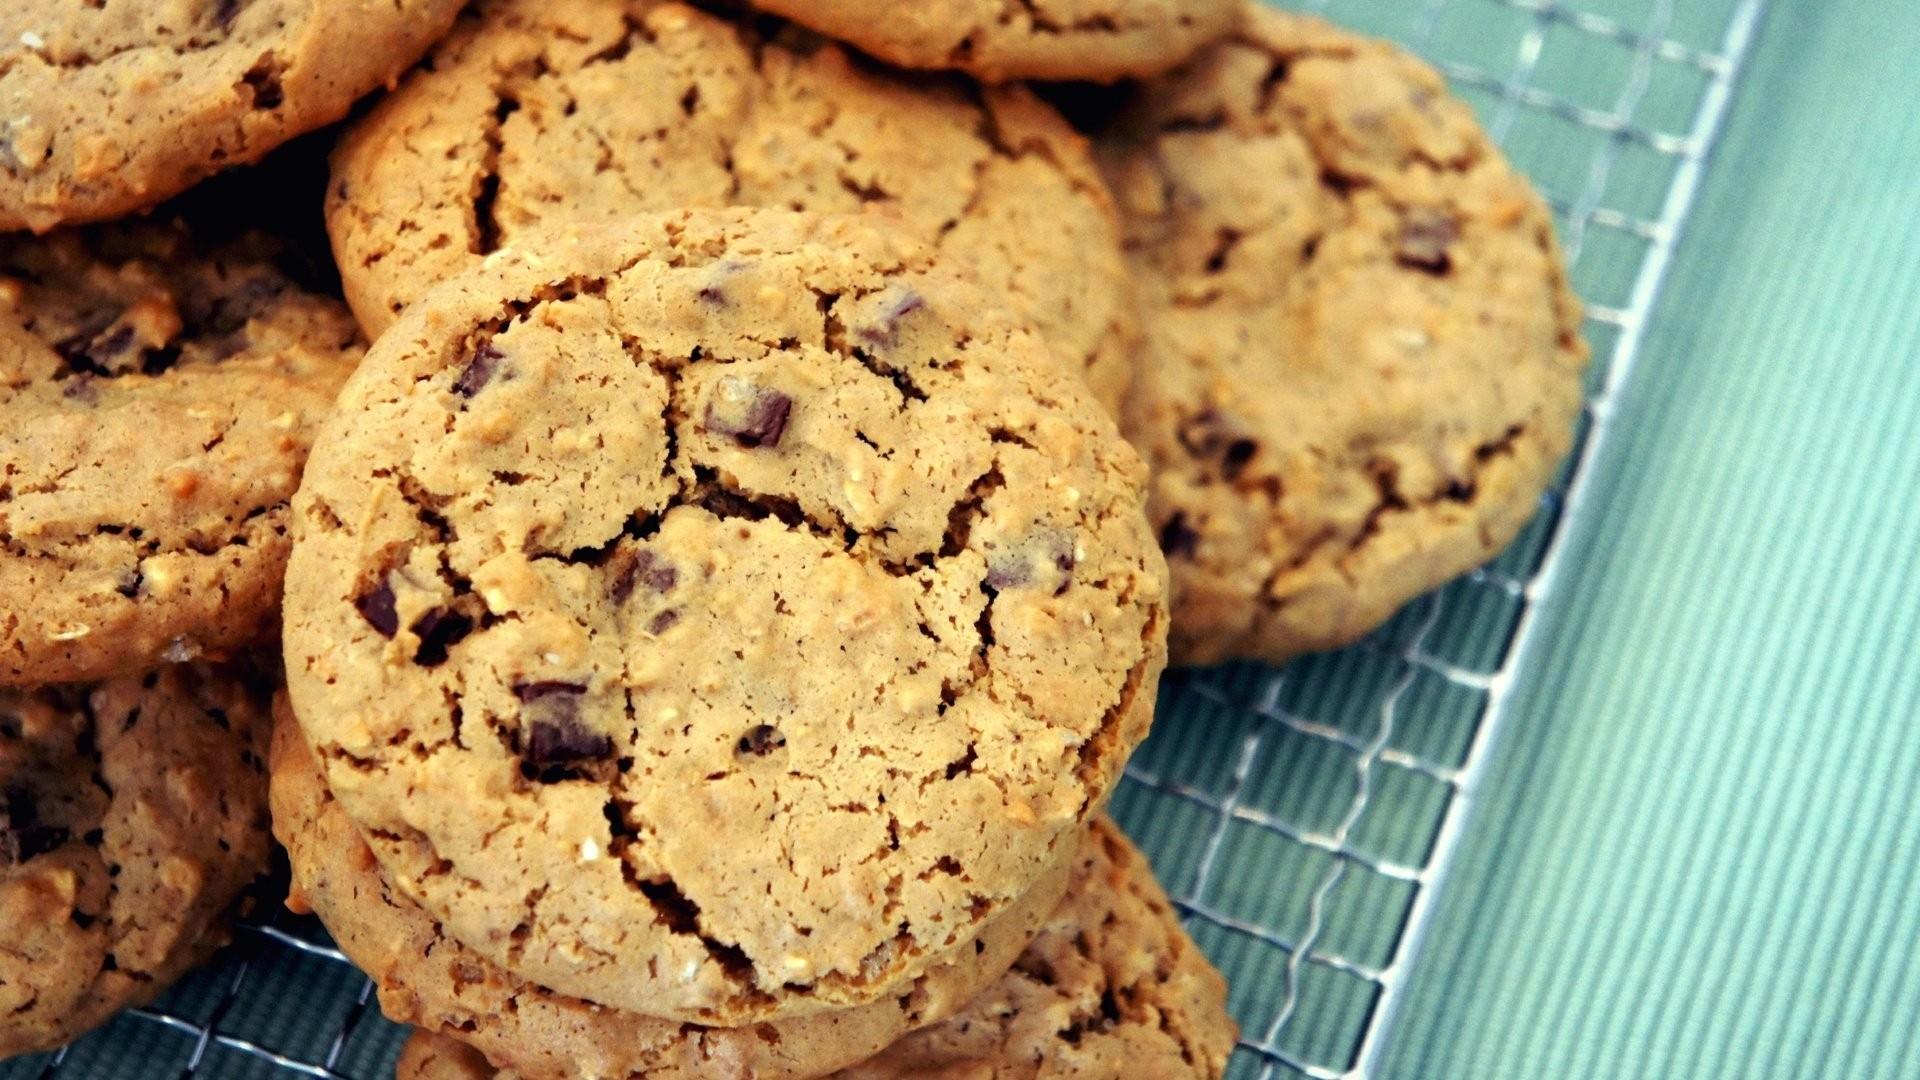 Cookies PC Wallpaper HD